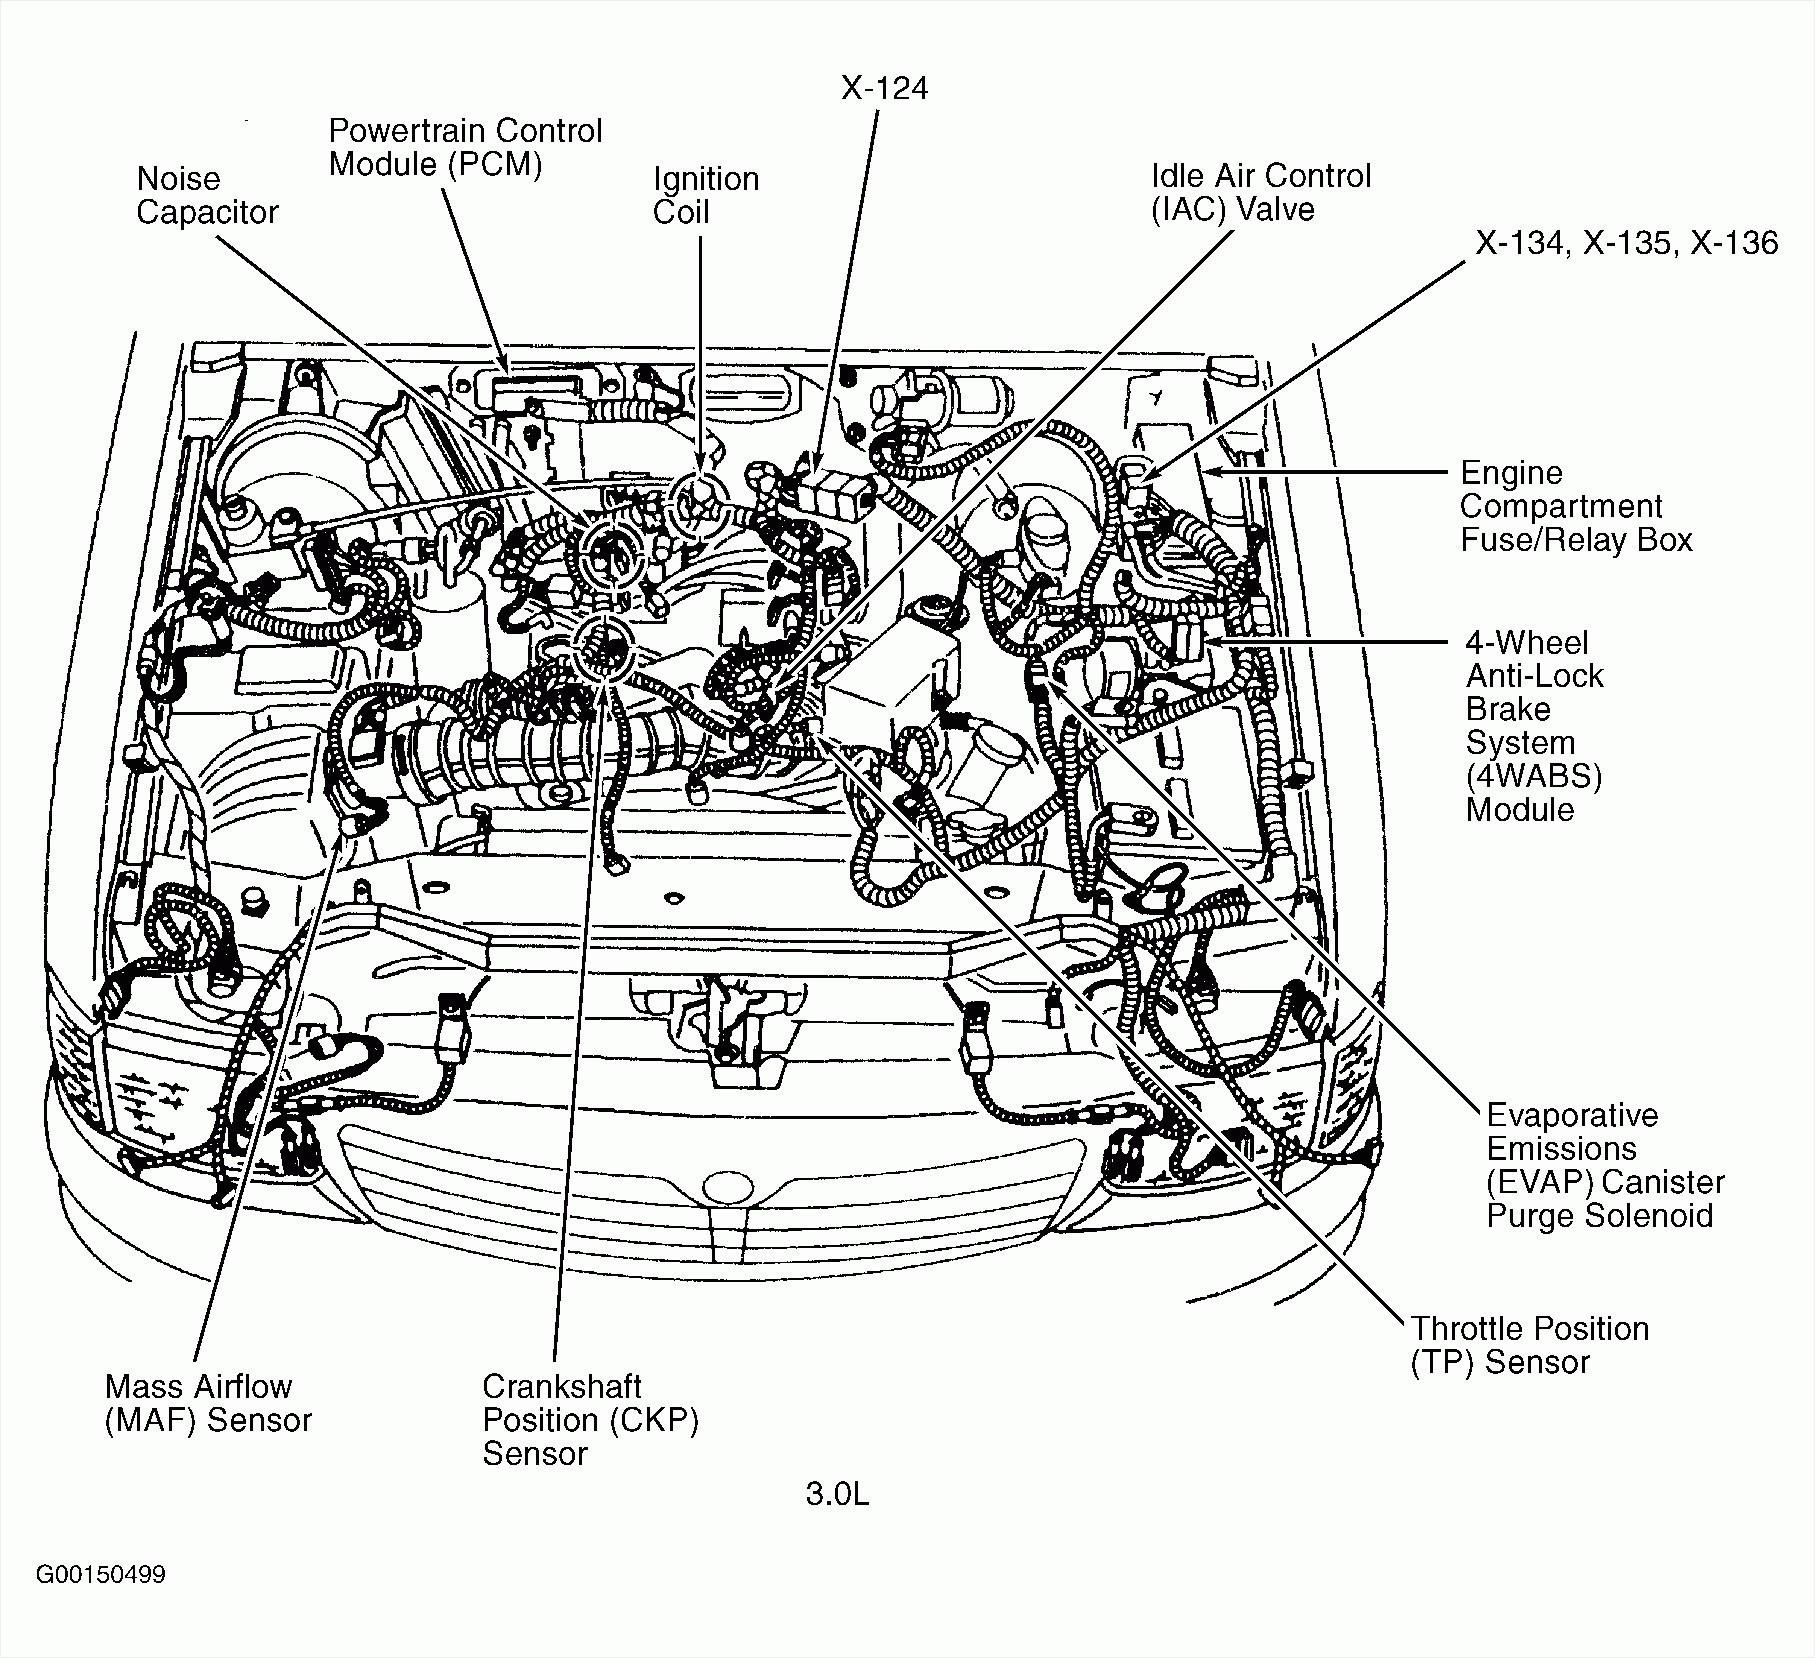 2002 Mazda Millenia Engine Diagram 2002 Mazda Millenia Engine Diagram Of 2002 Mazda Millenia Engine Diagram